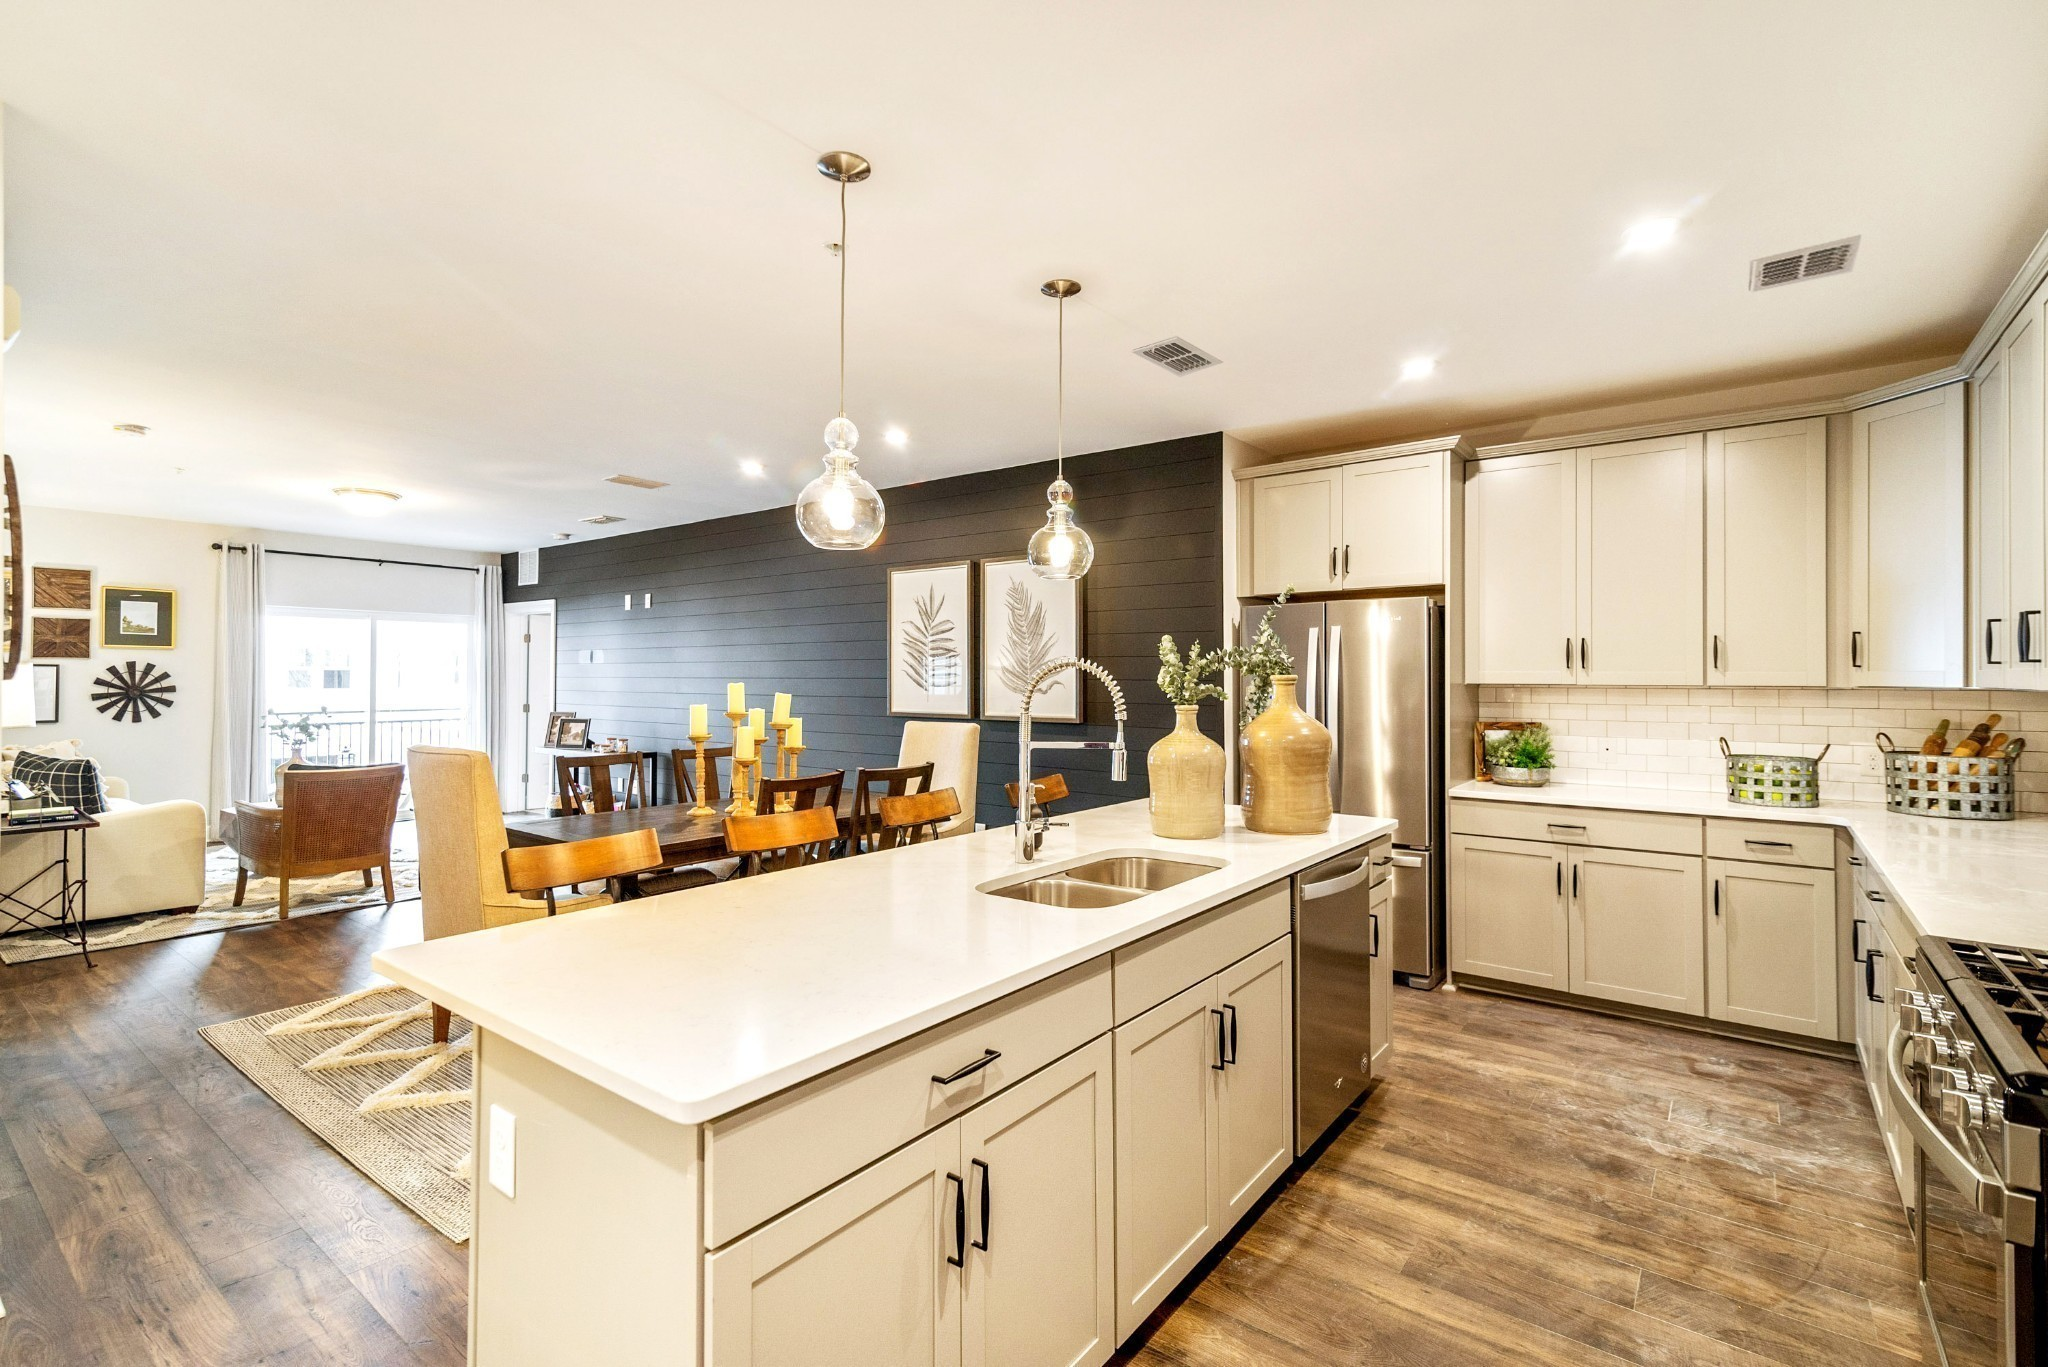 141 Saundersville Road #2408 Property Photo - Hendersonville, TN real estate listing